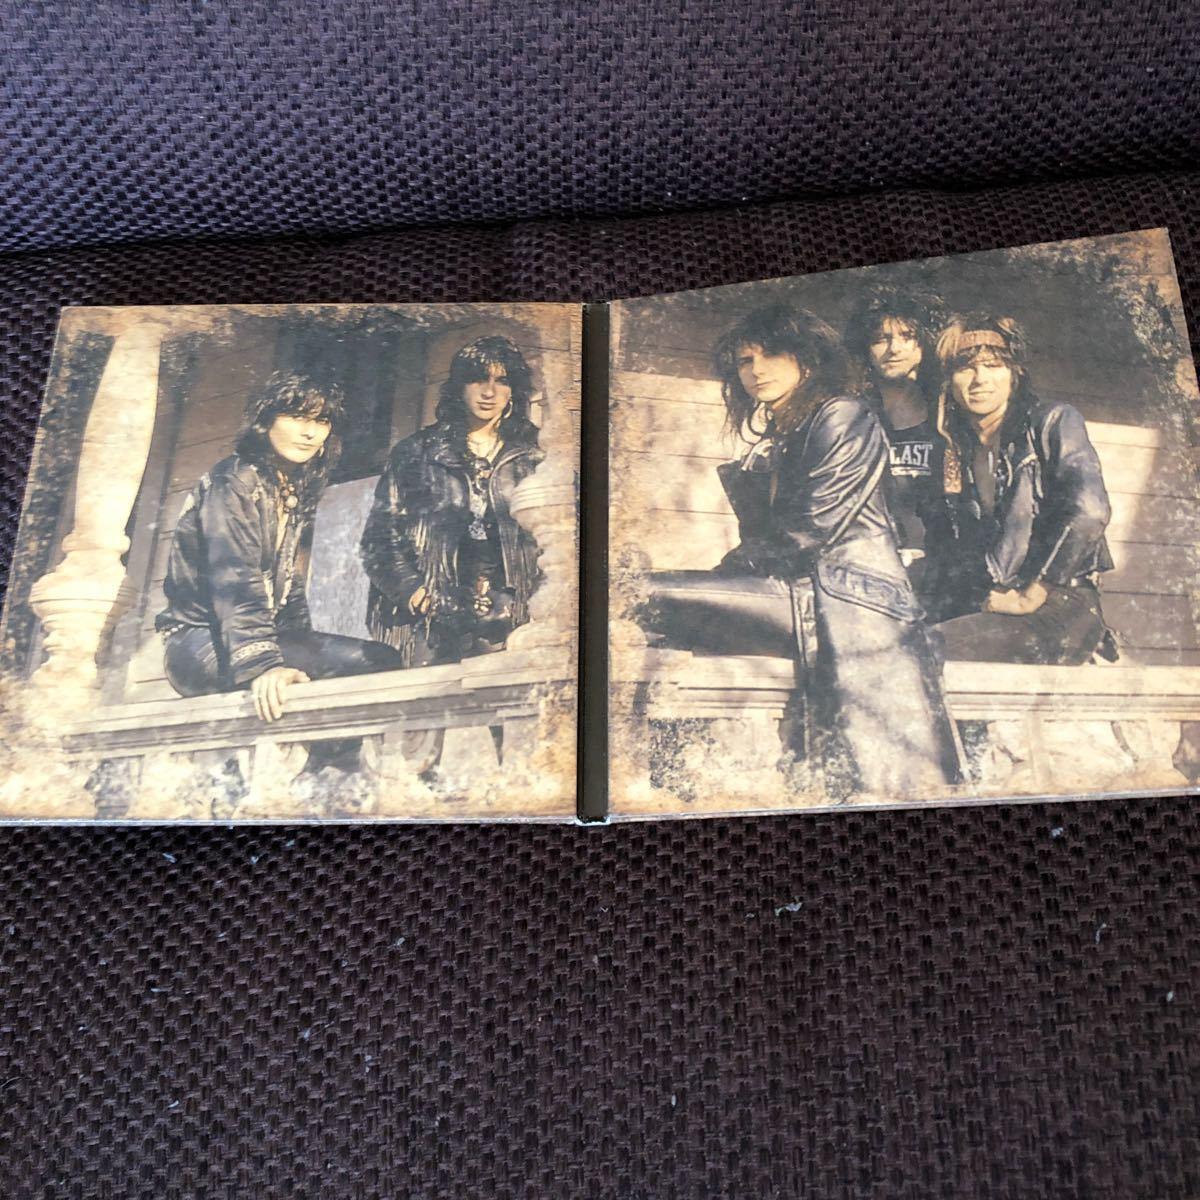 洋楽/L.A. Guns /A Fistful Of Guns - Anthology 1985-2012CD